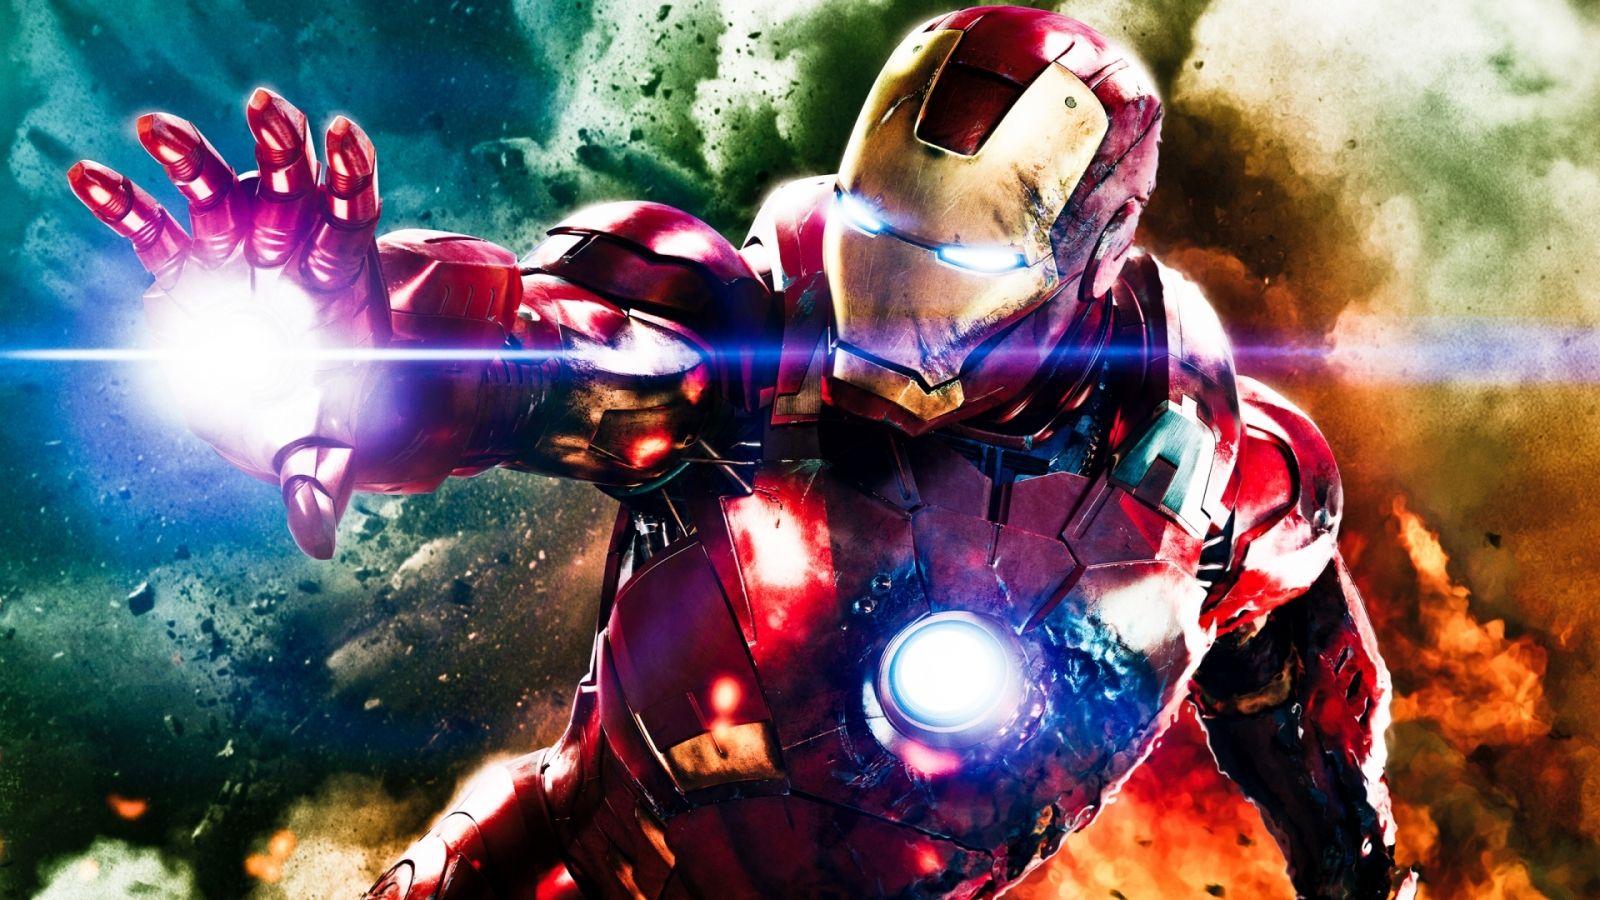 Iron Man Epic Wallpaper ironman tonystark avengers